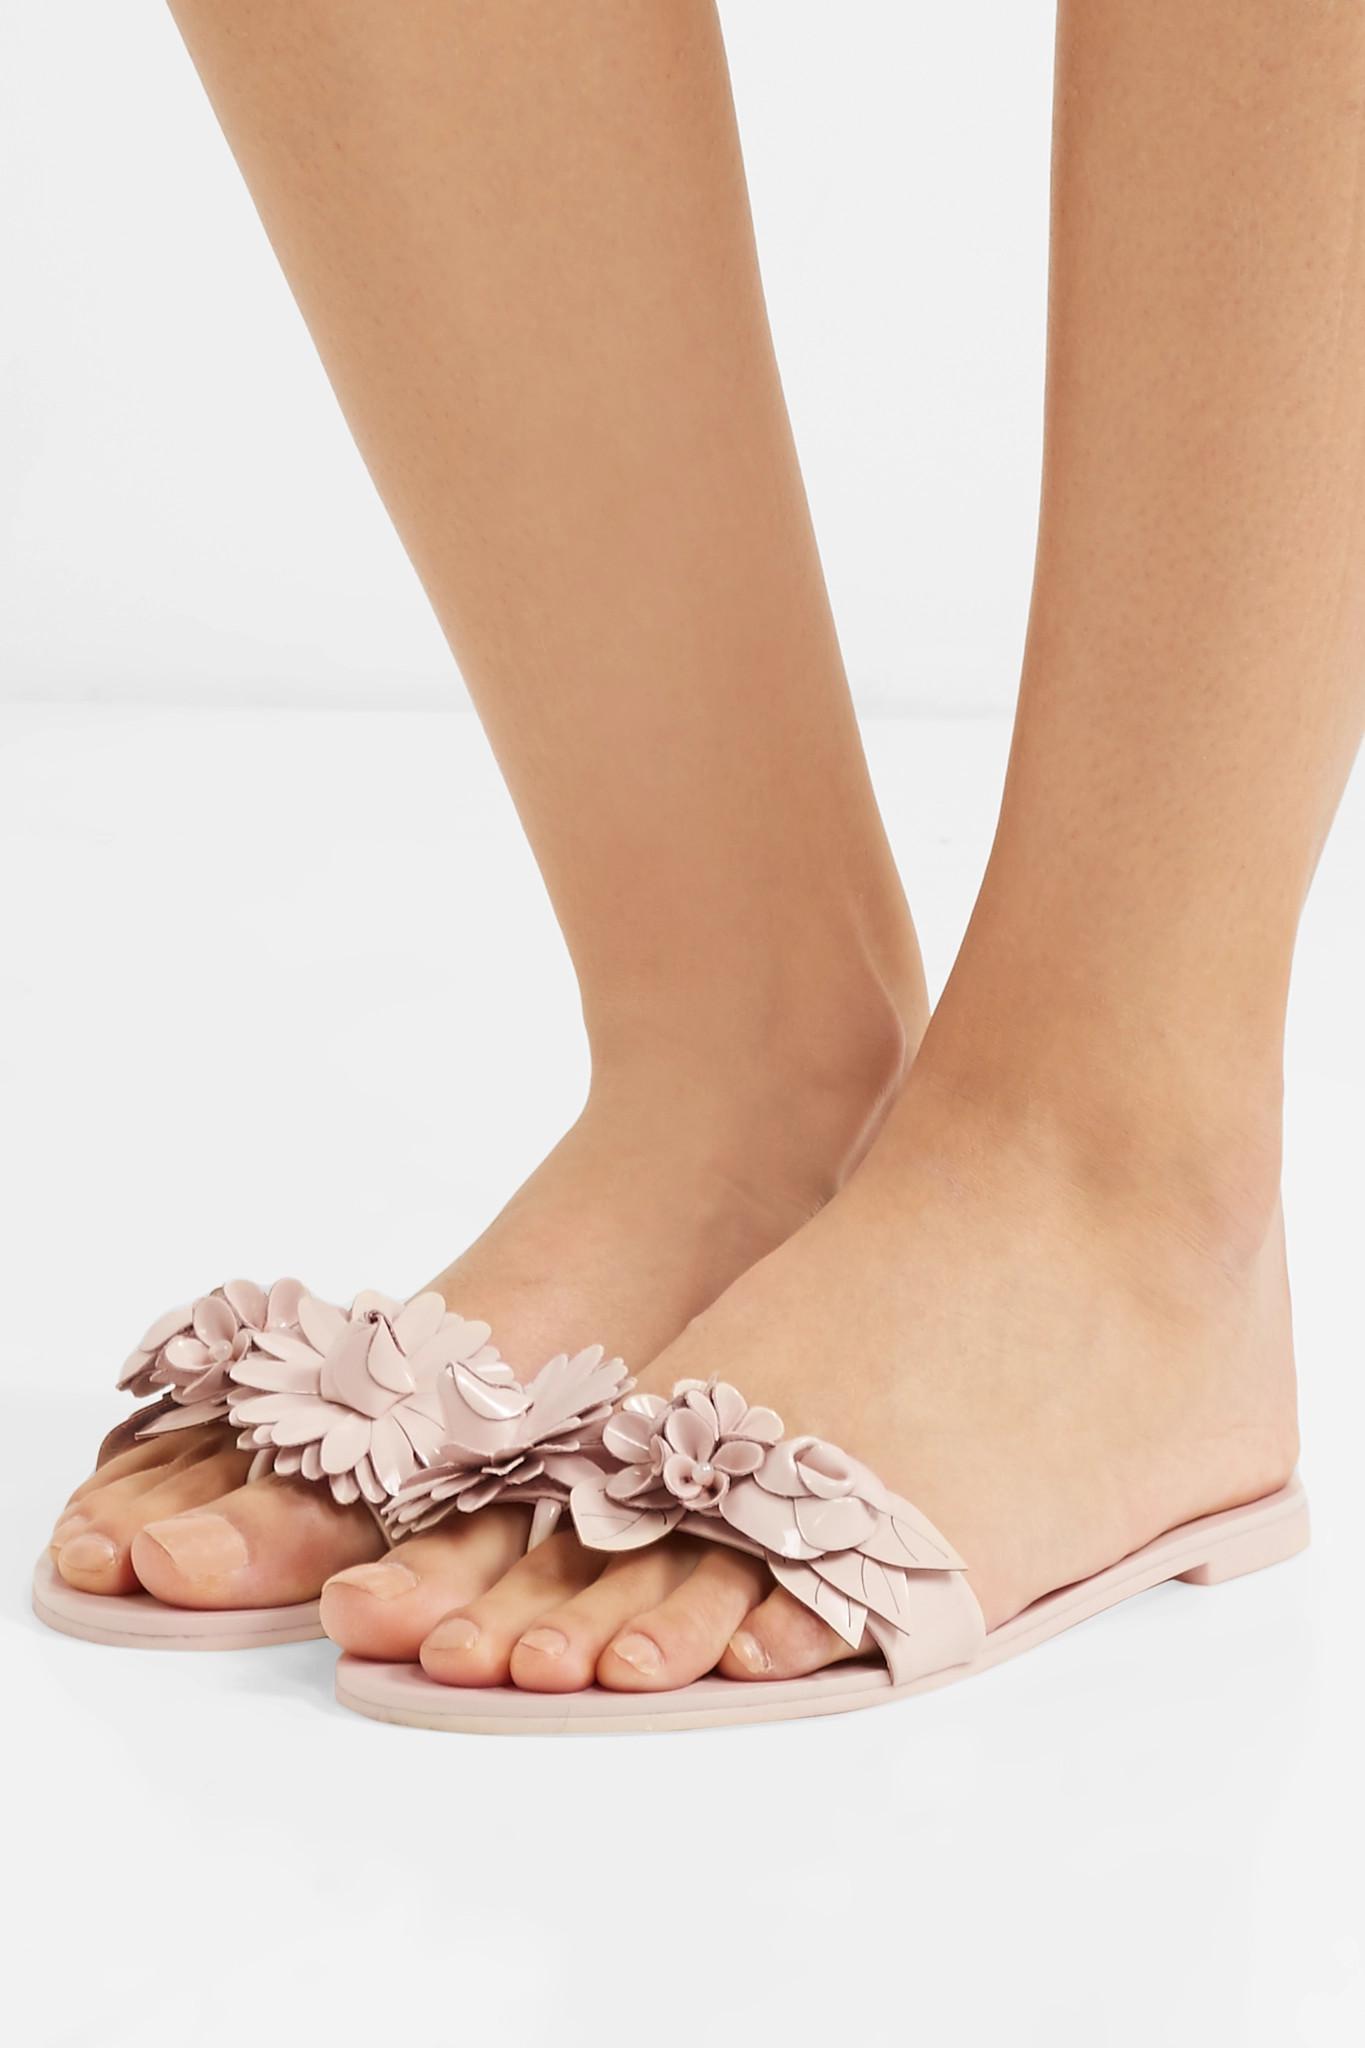 Recommend SOPHIA WEBSTER Lilico Embellished Patent-leather Slides - Blush Discount Outlet Best Wholesale Purchase Online Kre2ueHhzk